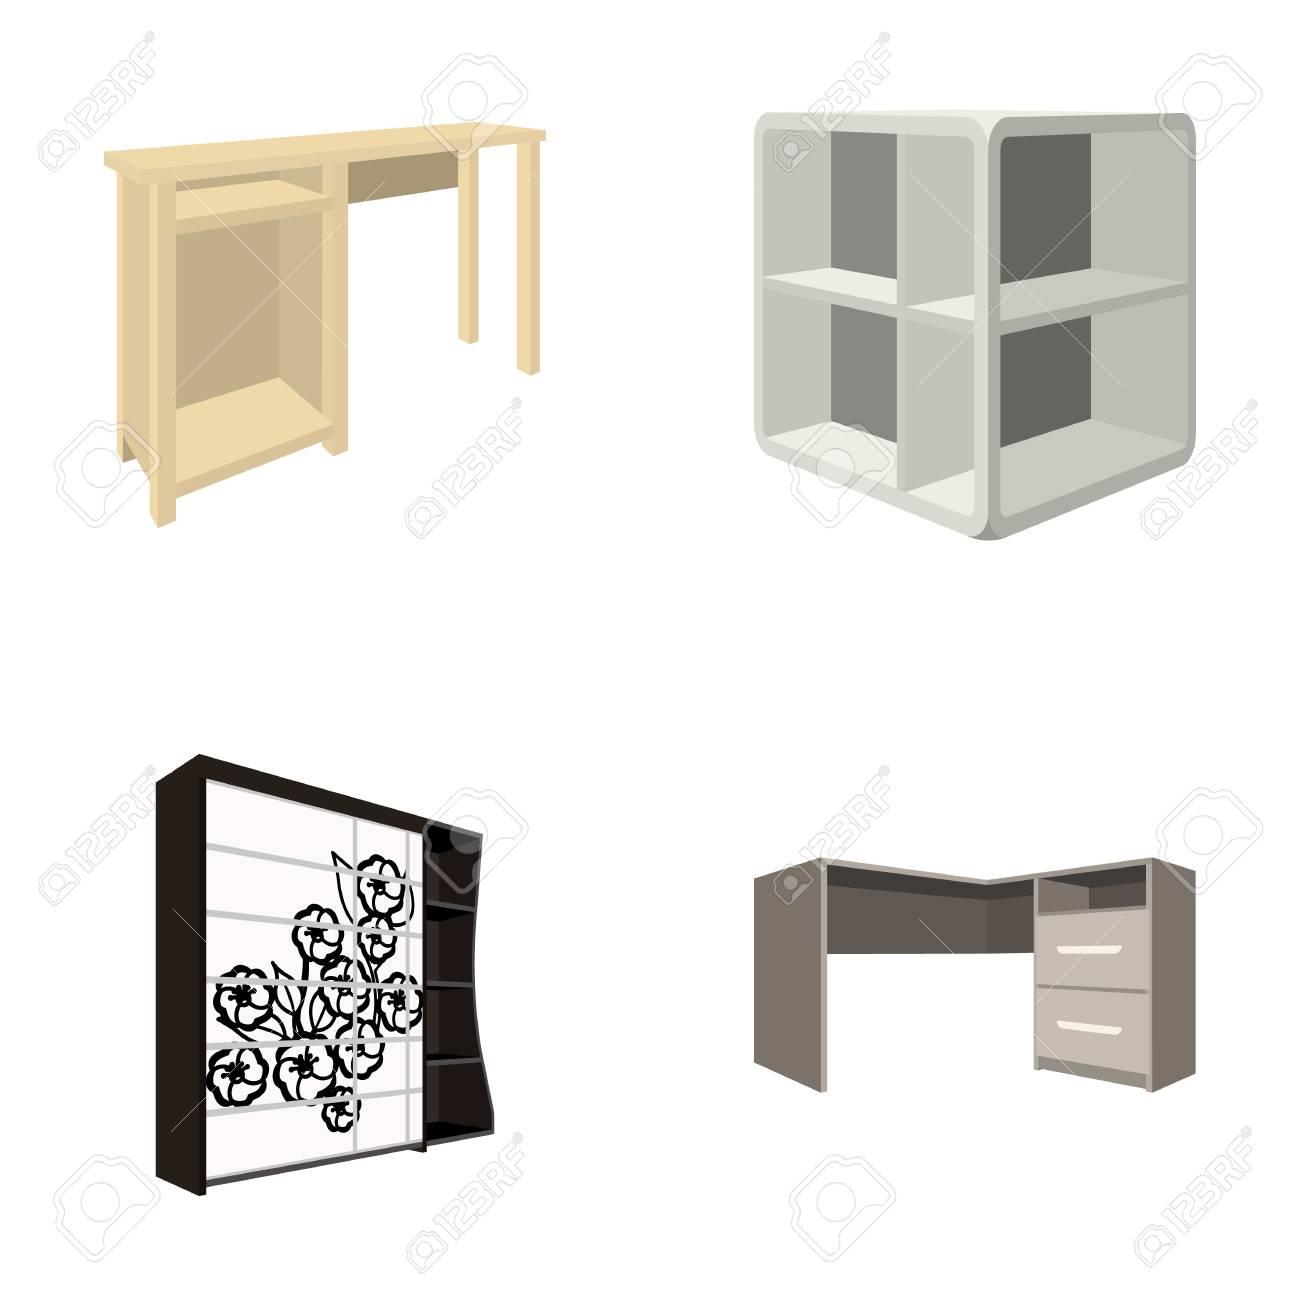 A Dressing Table, Corner Shelves, Computer Desk, Wardrobe With ...